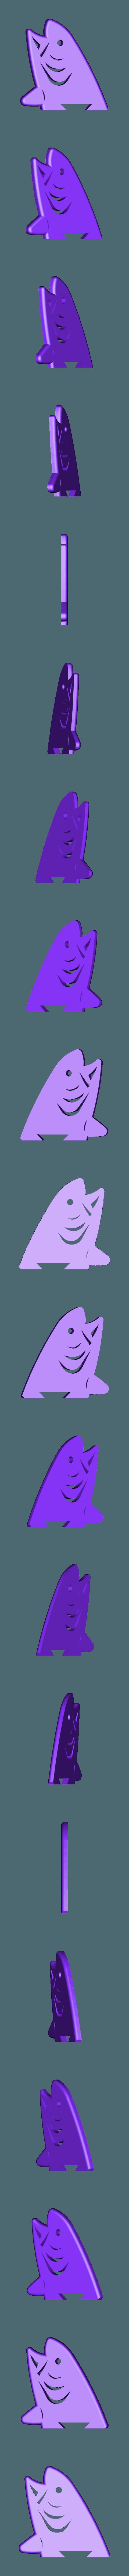 Fish_Headphone_Stand_Organiser_Fish_Left_2.STL Download free STL file Fish Headphone Stand Organiser • 3D printing model, inProgressDesigns